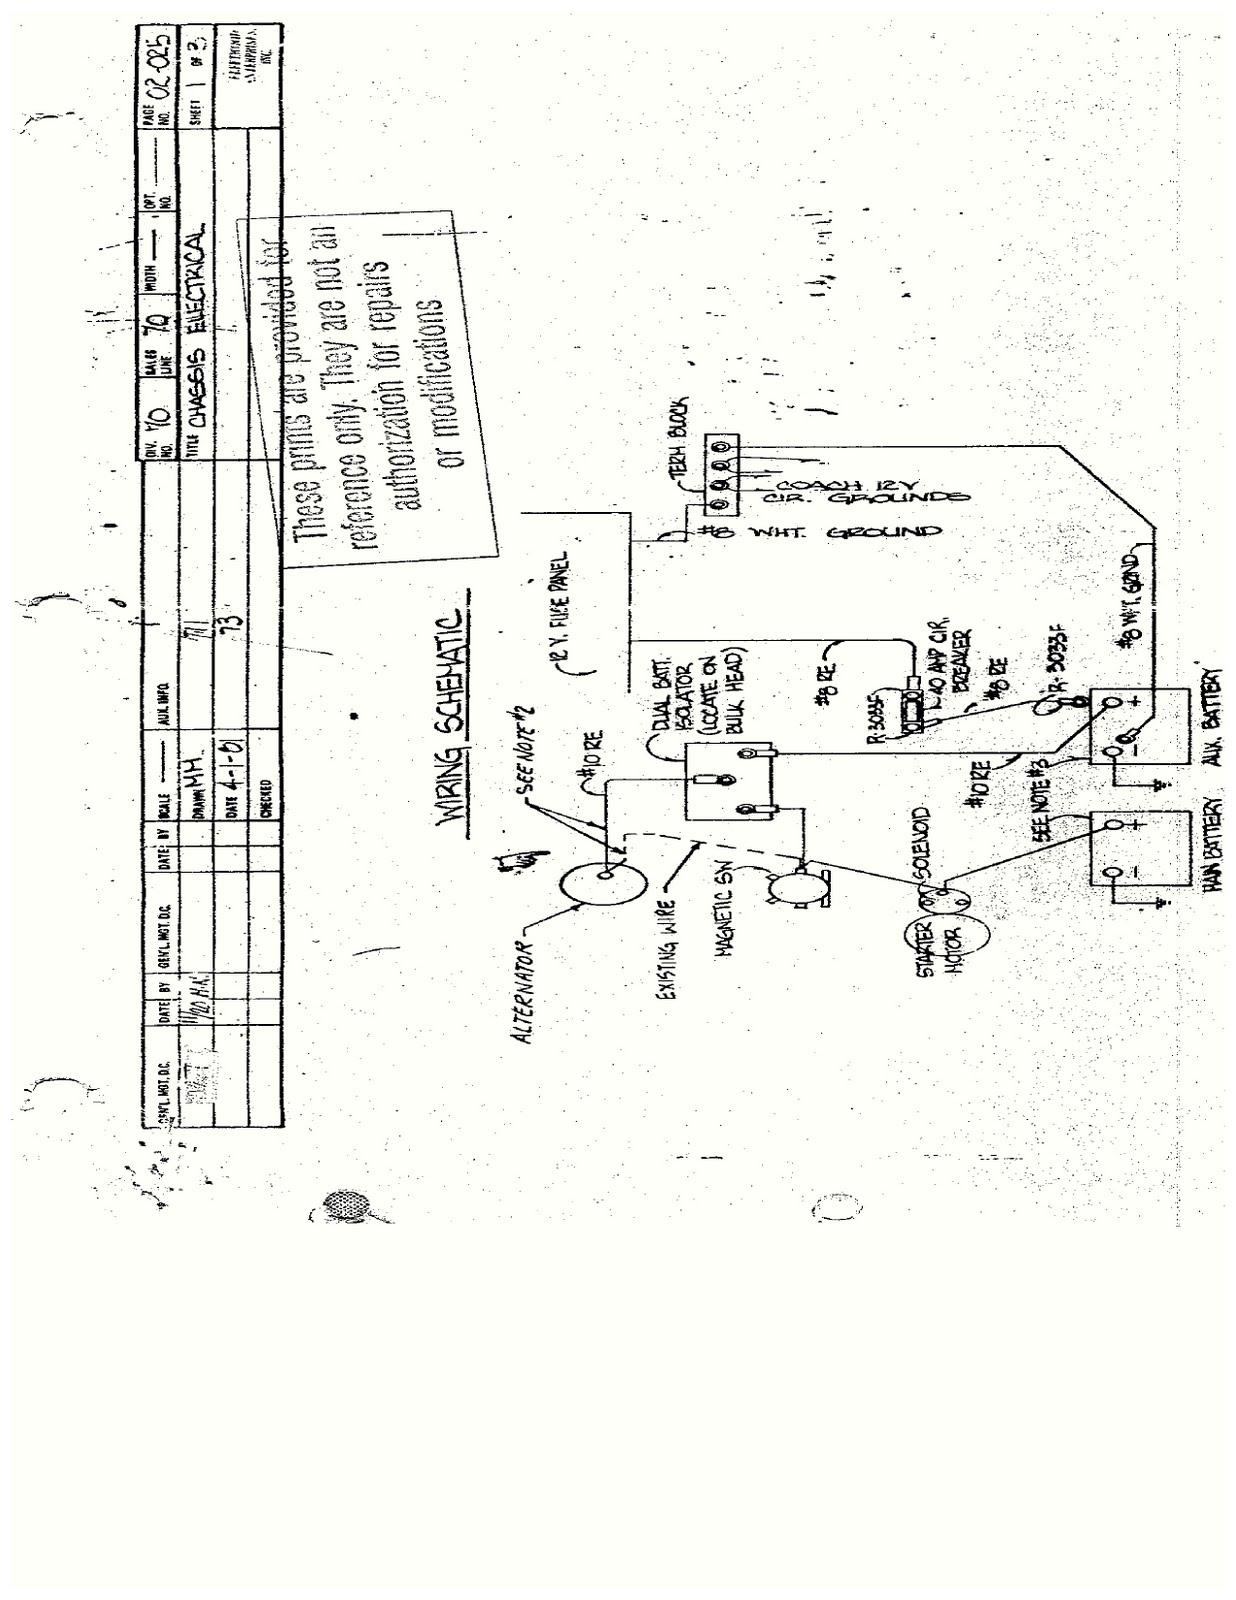 small resolution of 1984 pontiac fiero fuse box diagram 1986 pontiac fiero 97 chevy p30 dashboard 97 chevy malibu